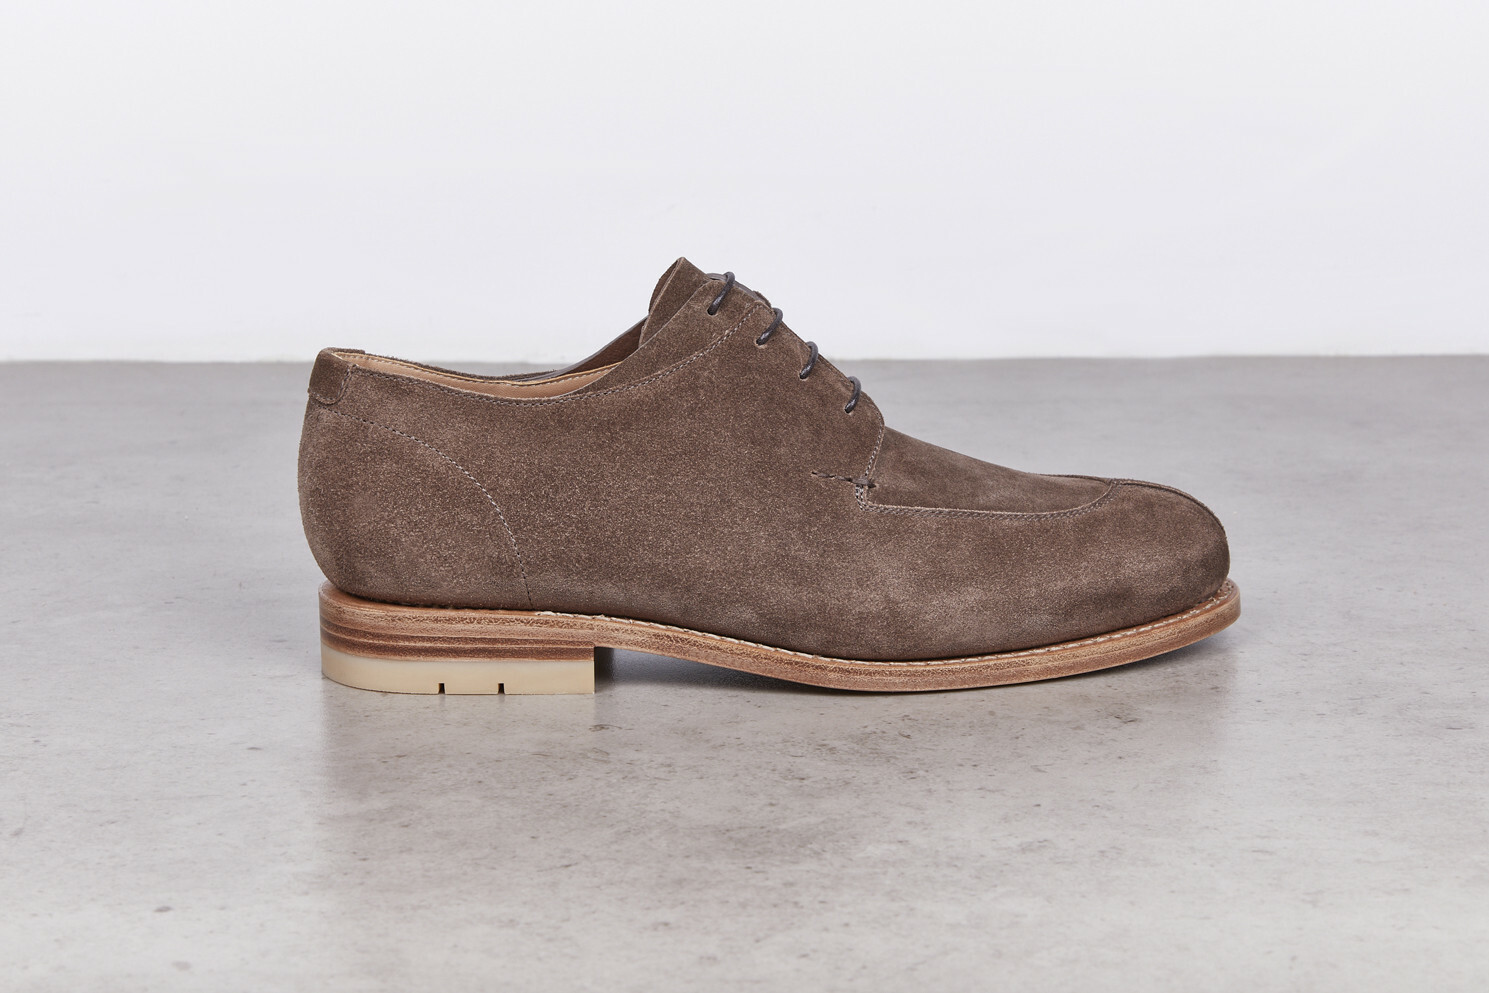 SALVIA Taupe Calf Suede Leather